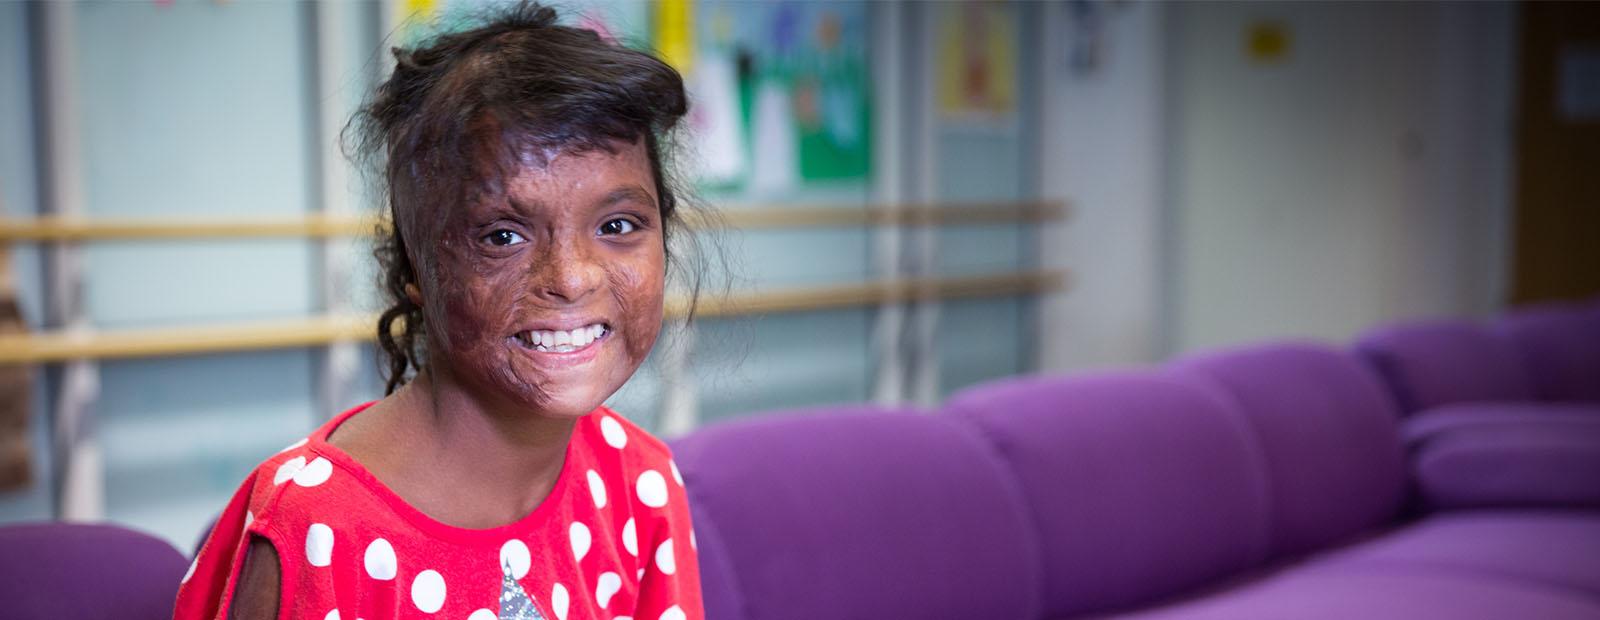 Burned Childrens' Fund: Helping Burned Children